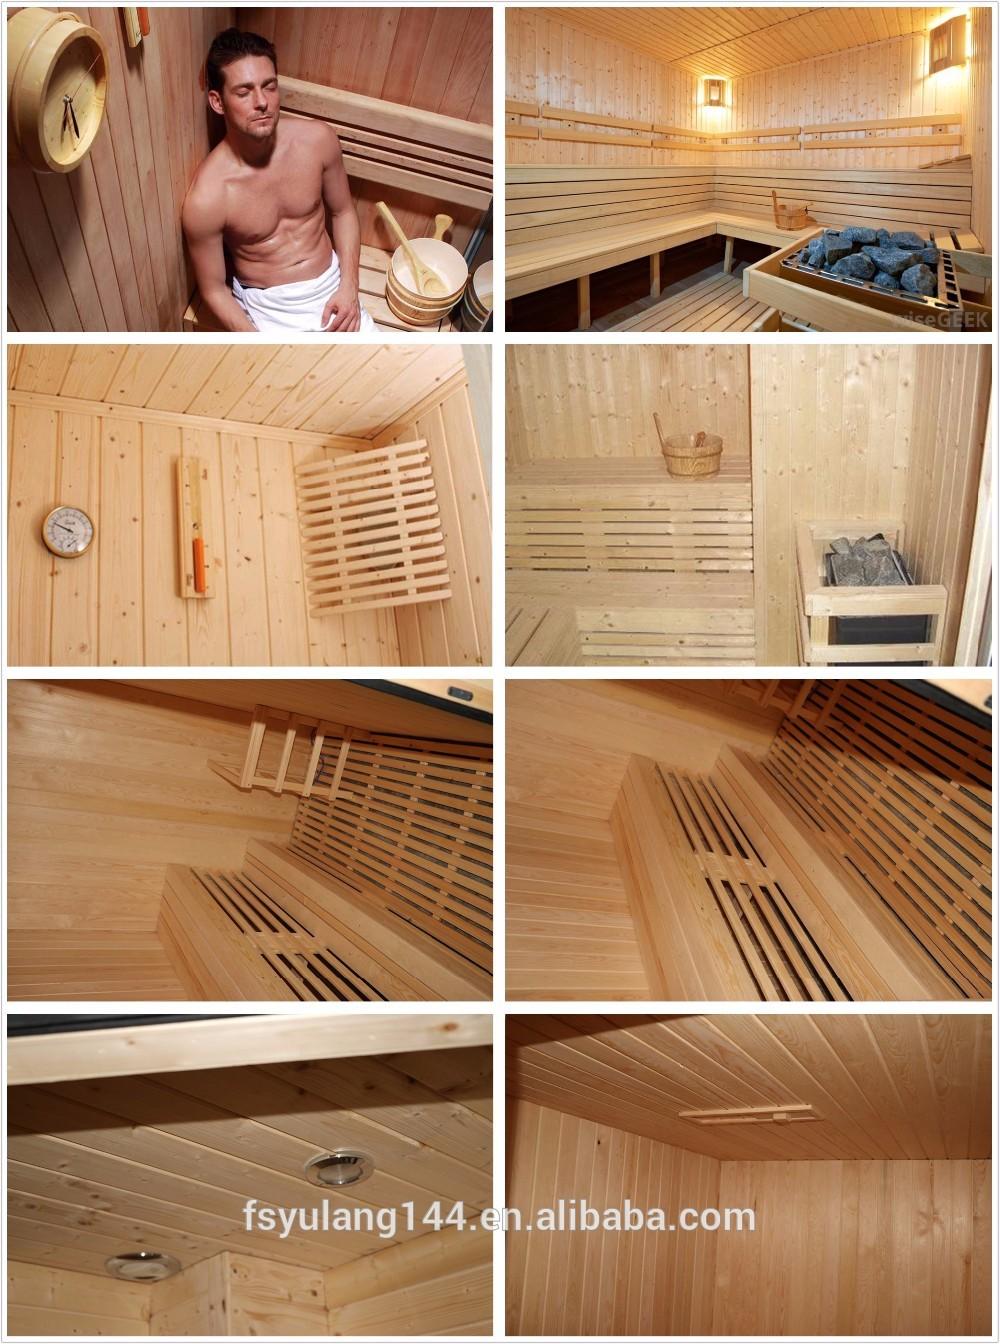 sauna room details-1.jpg